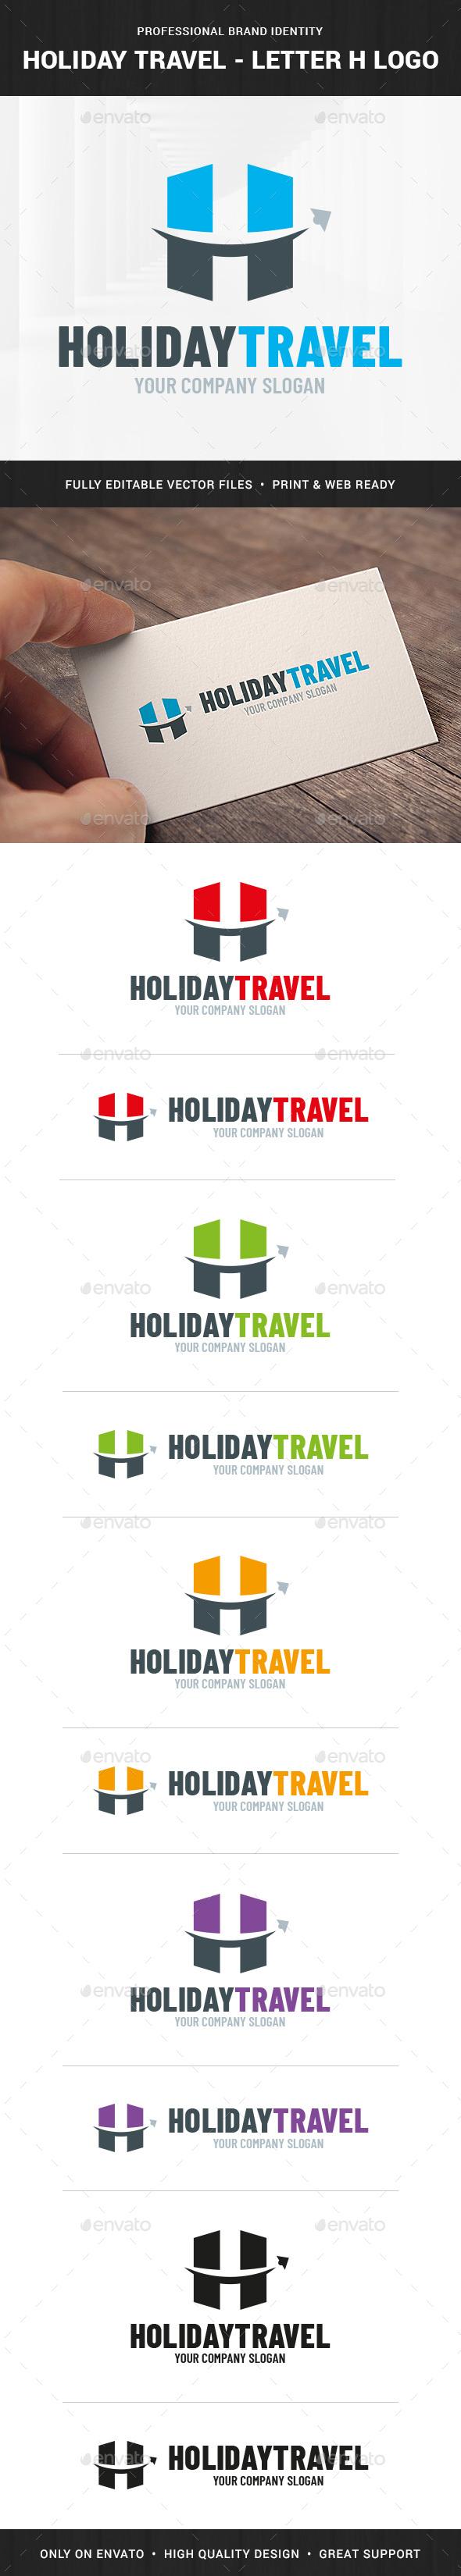 Holiday Travel - Letter H Logo